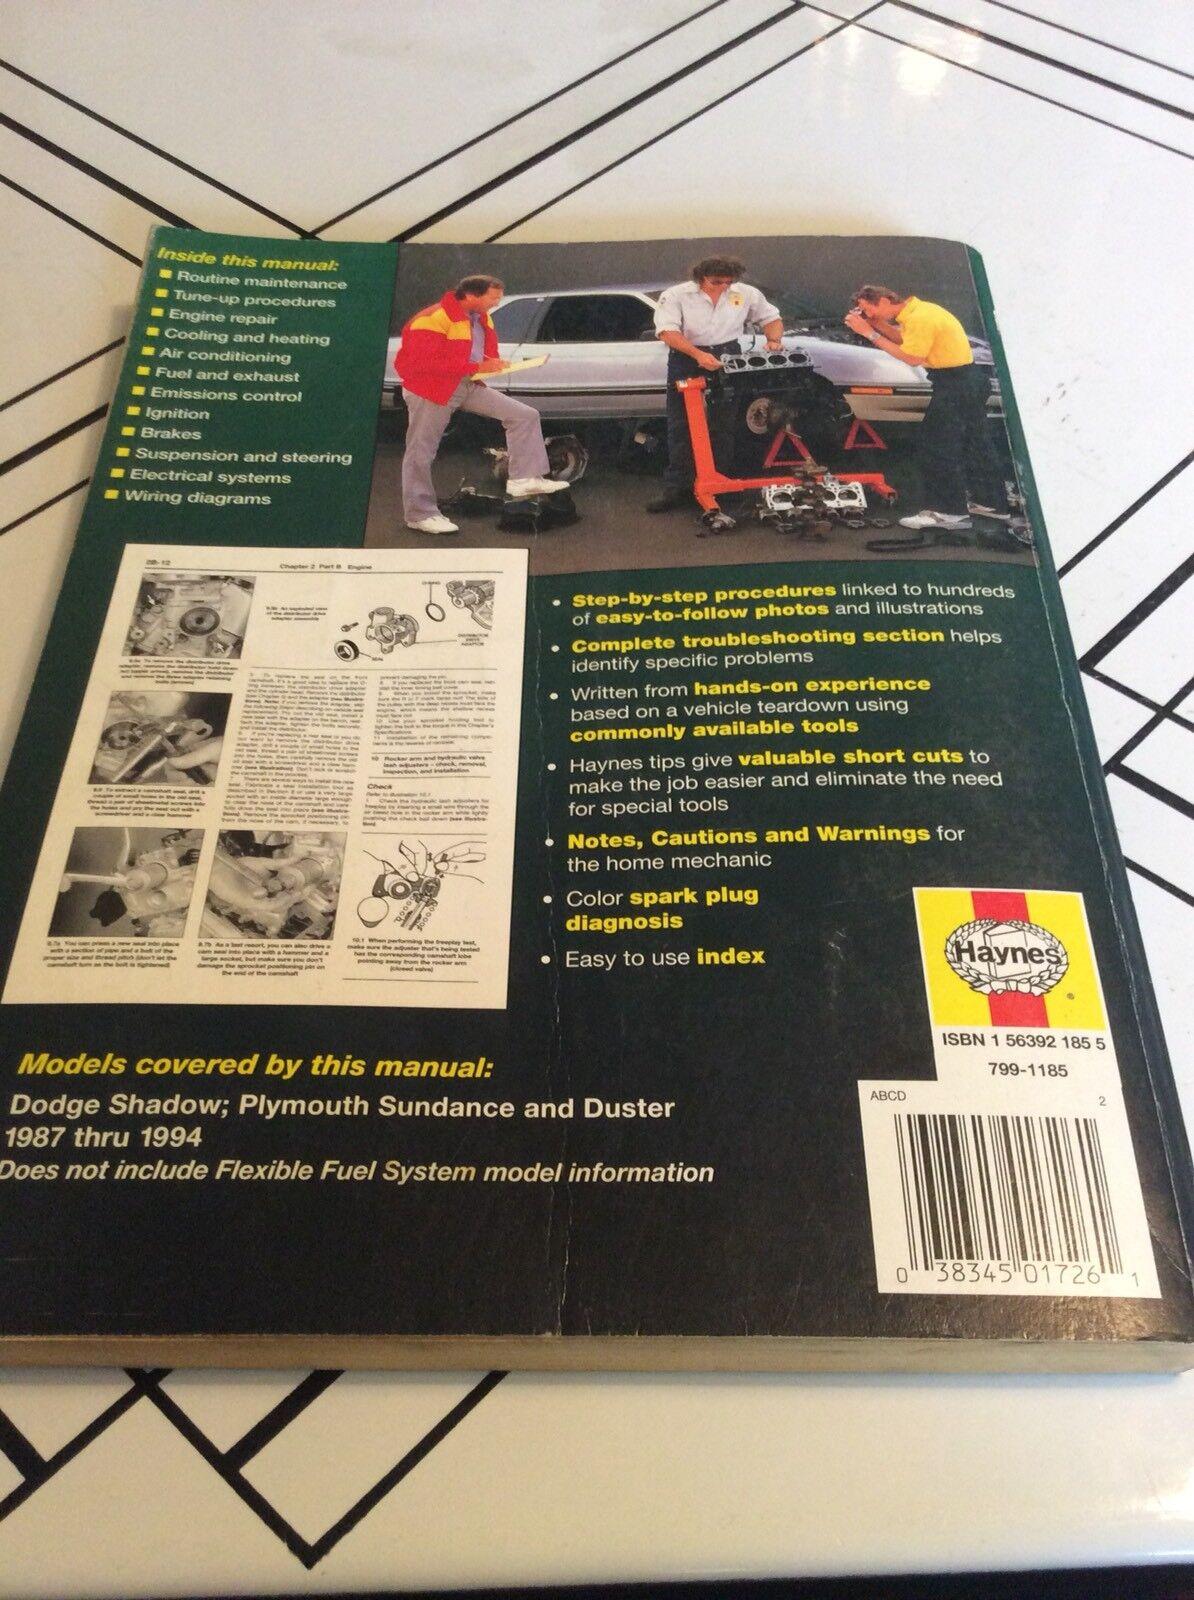 Haynes Repair Manual 30055 Dodge Shadow Plymouth Sundance Duster 1987 to  1994 | eBay